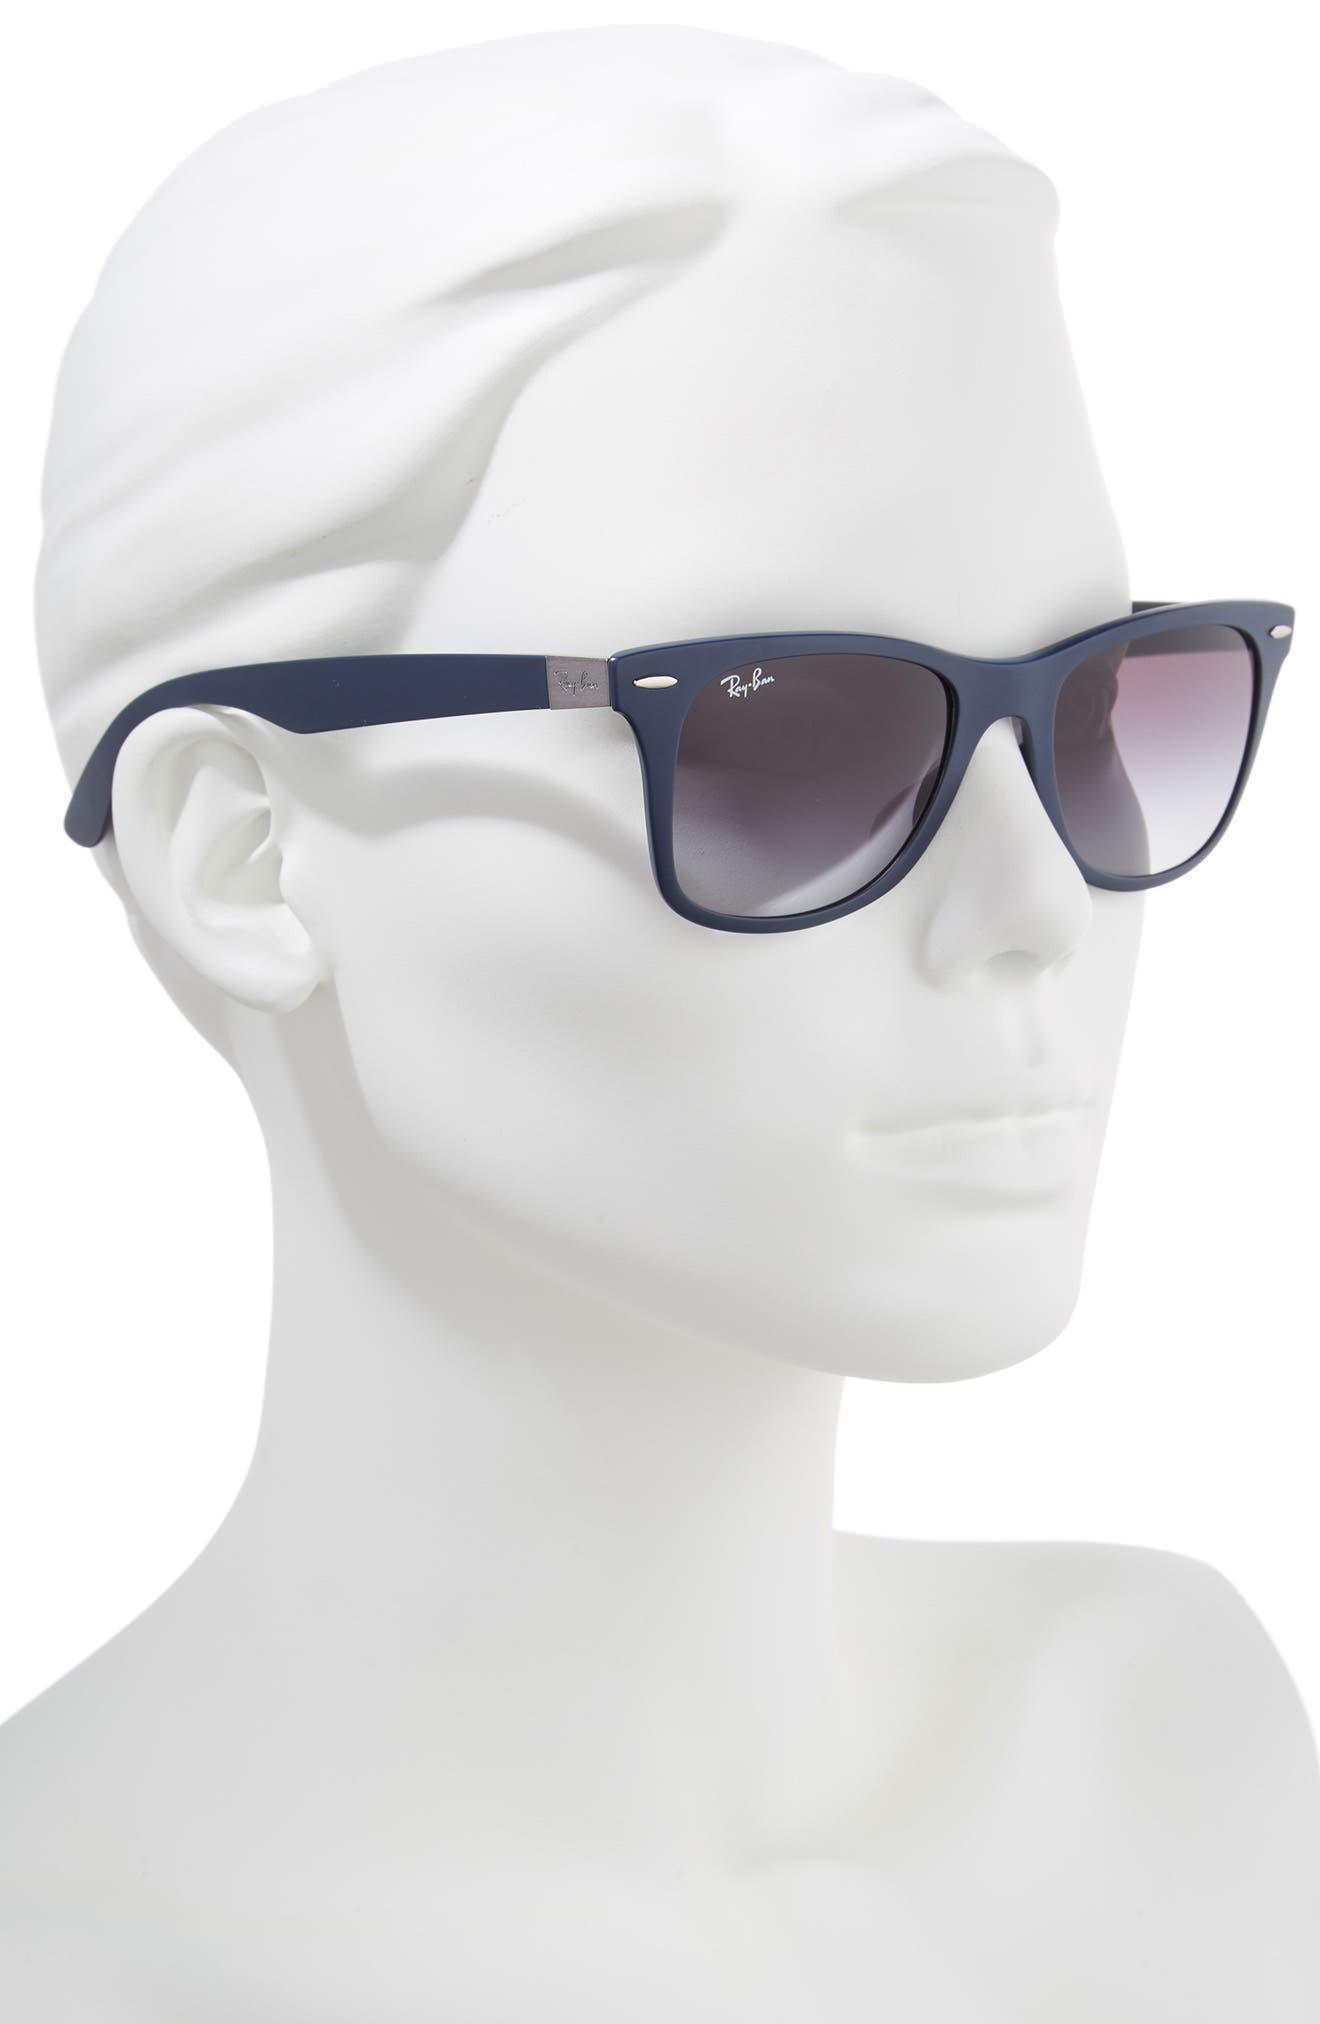 52mm Sunglasses,                             Alternate thumbnail 2, color,                             Blue/ Grey